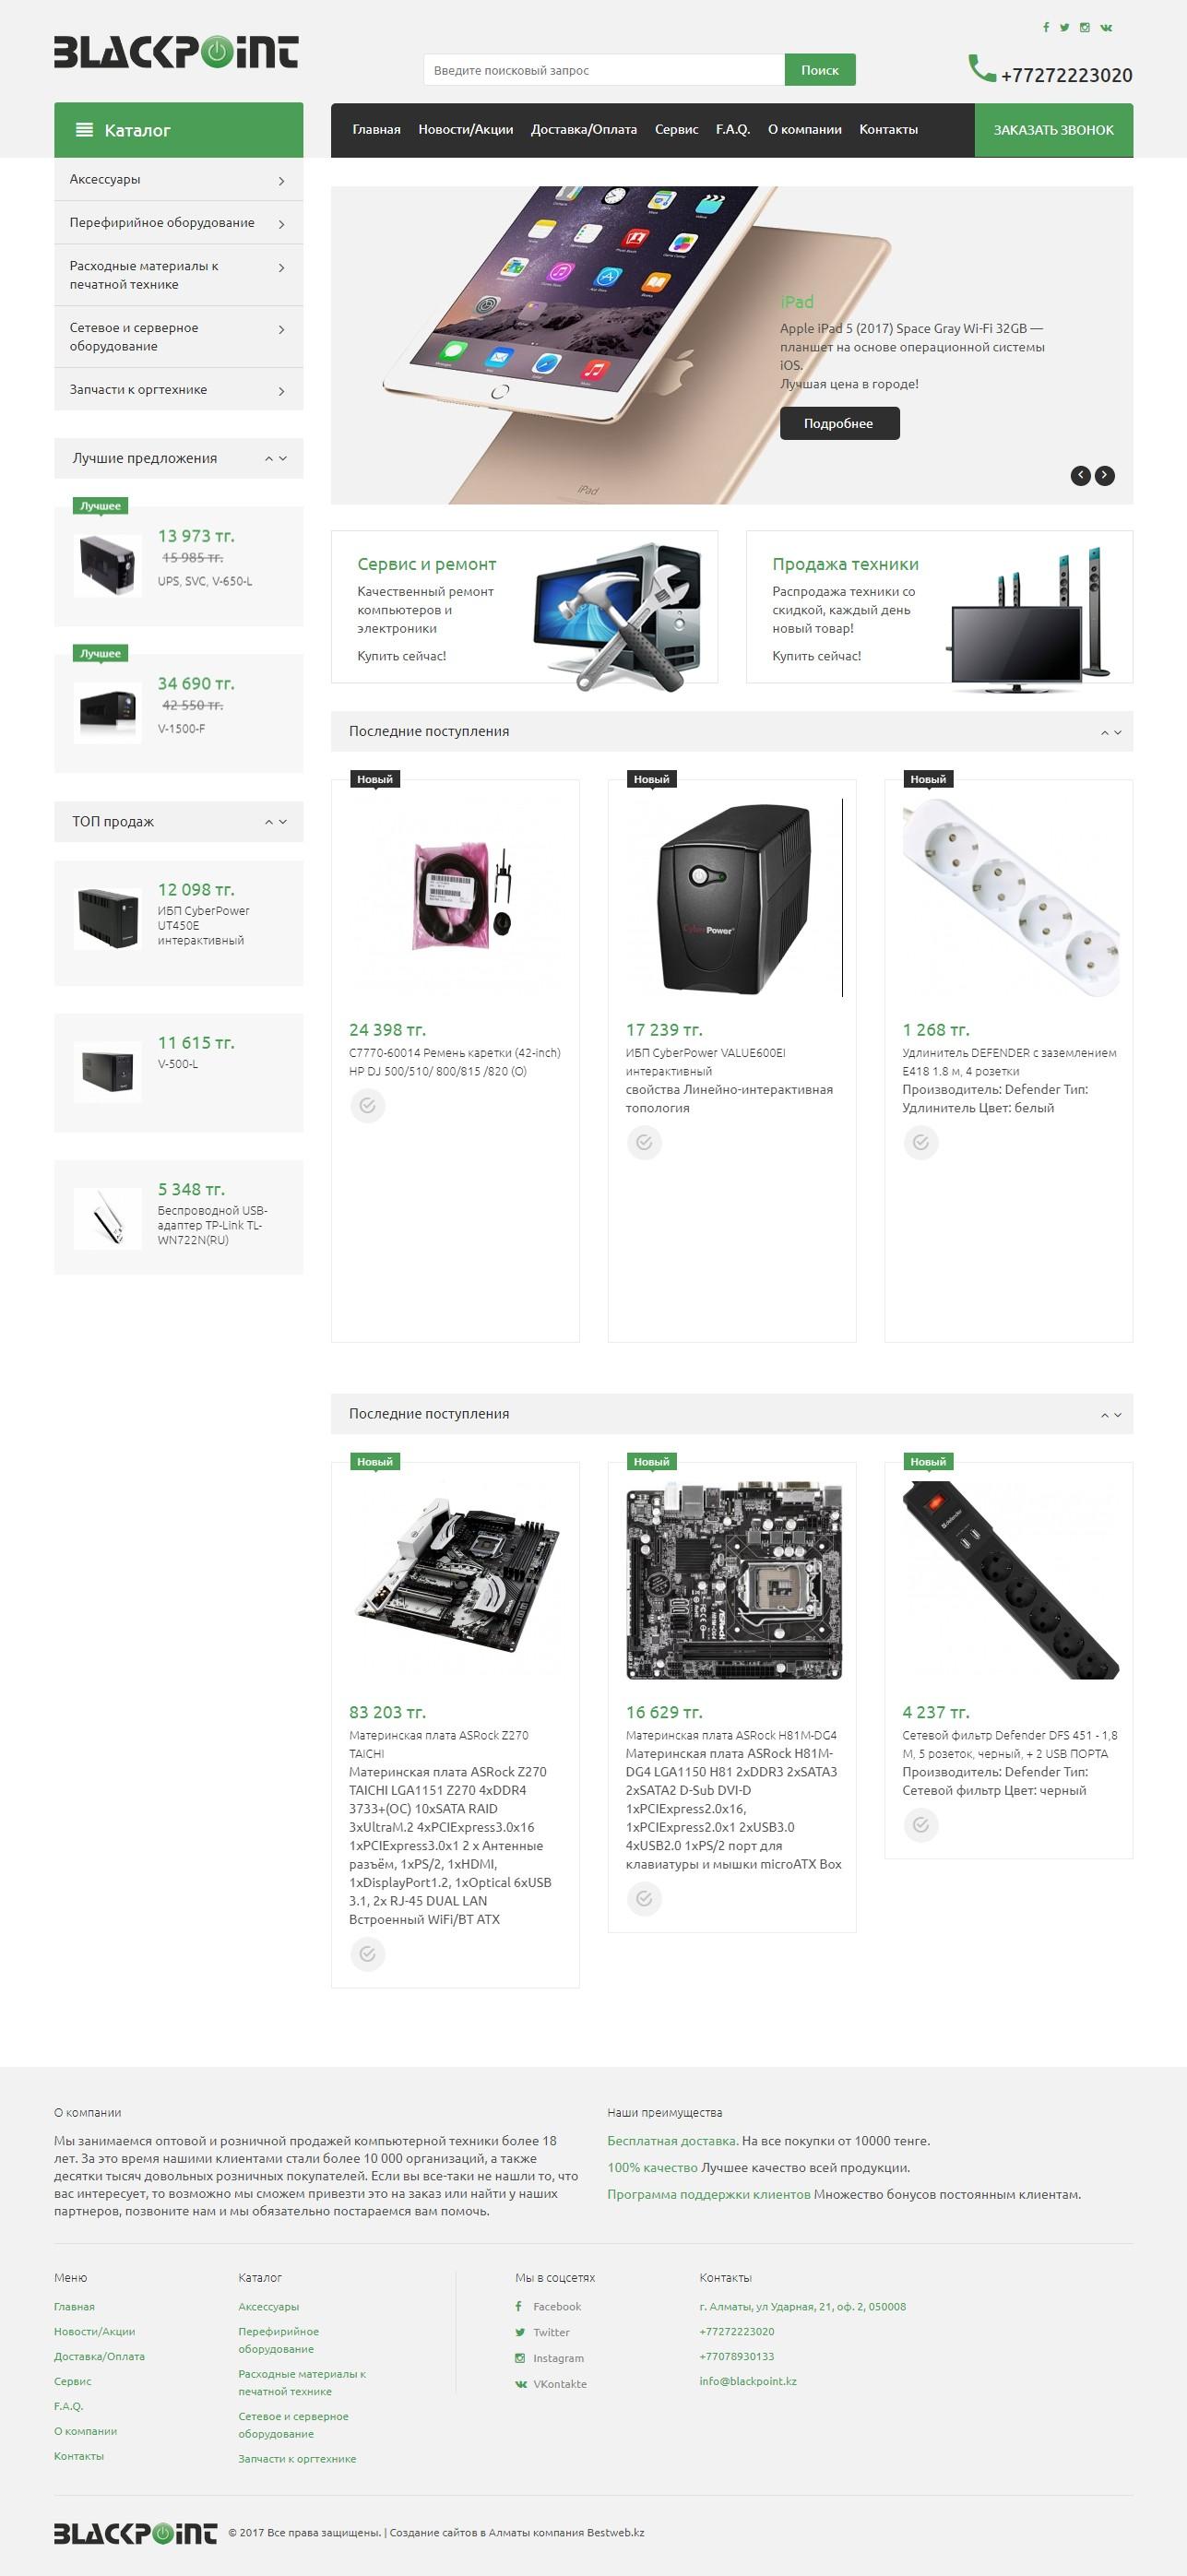 Корпоративный сайт с каталогом компании BlackPoint